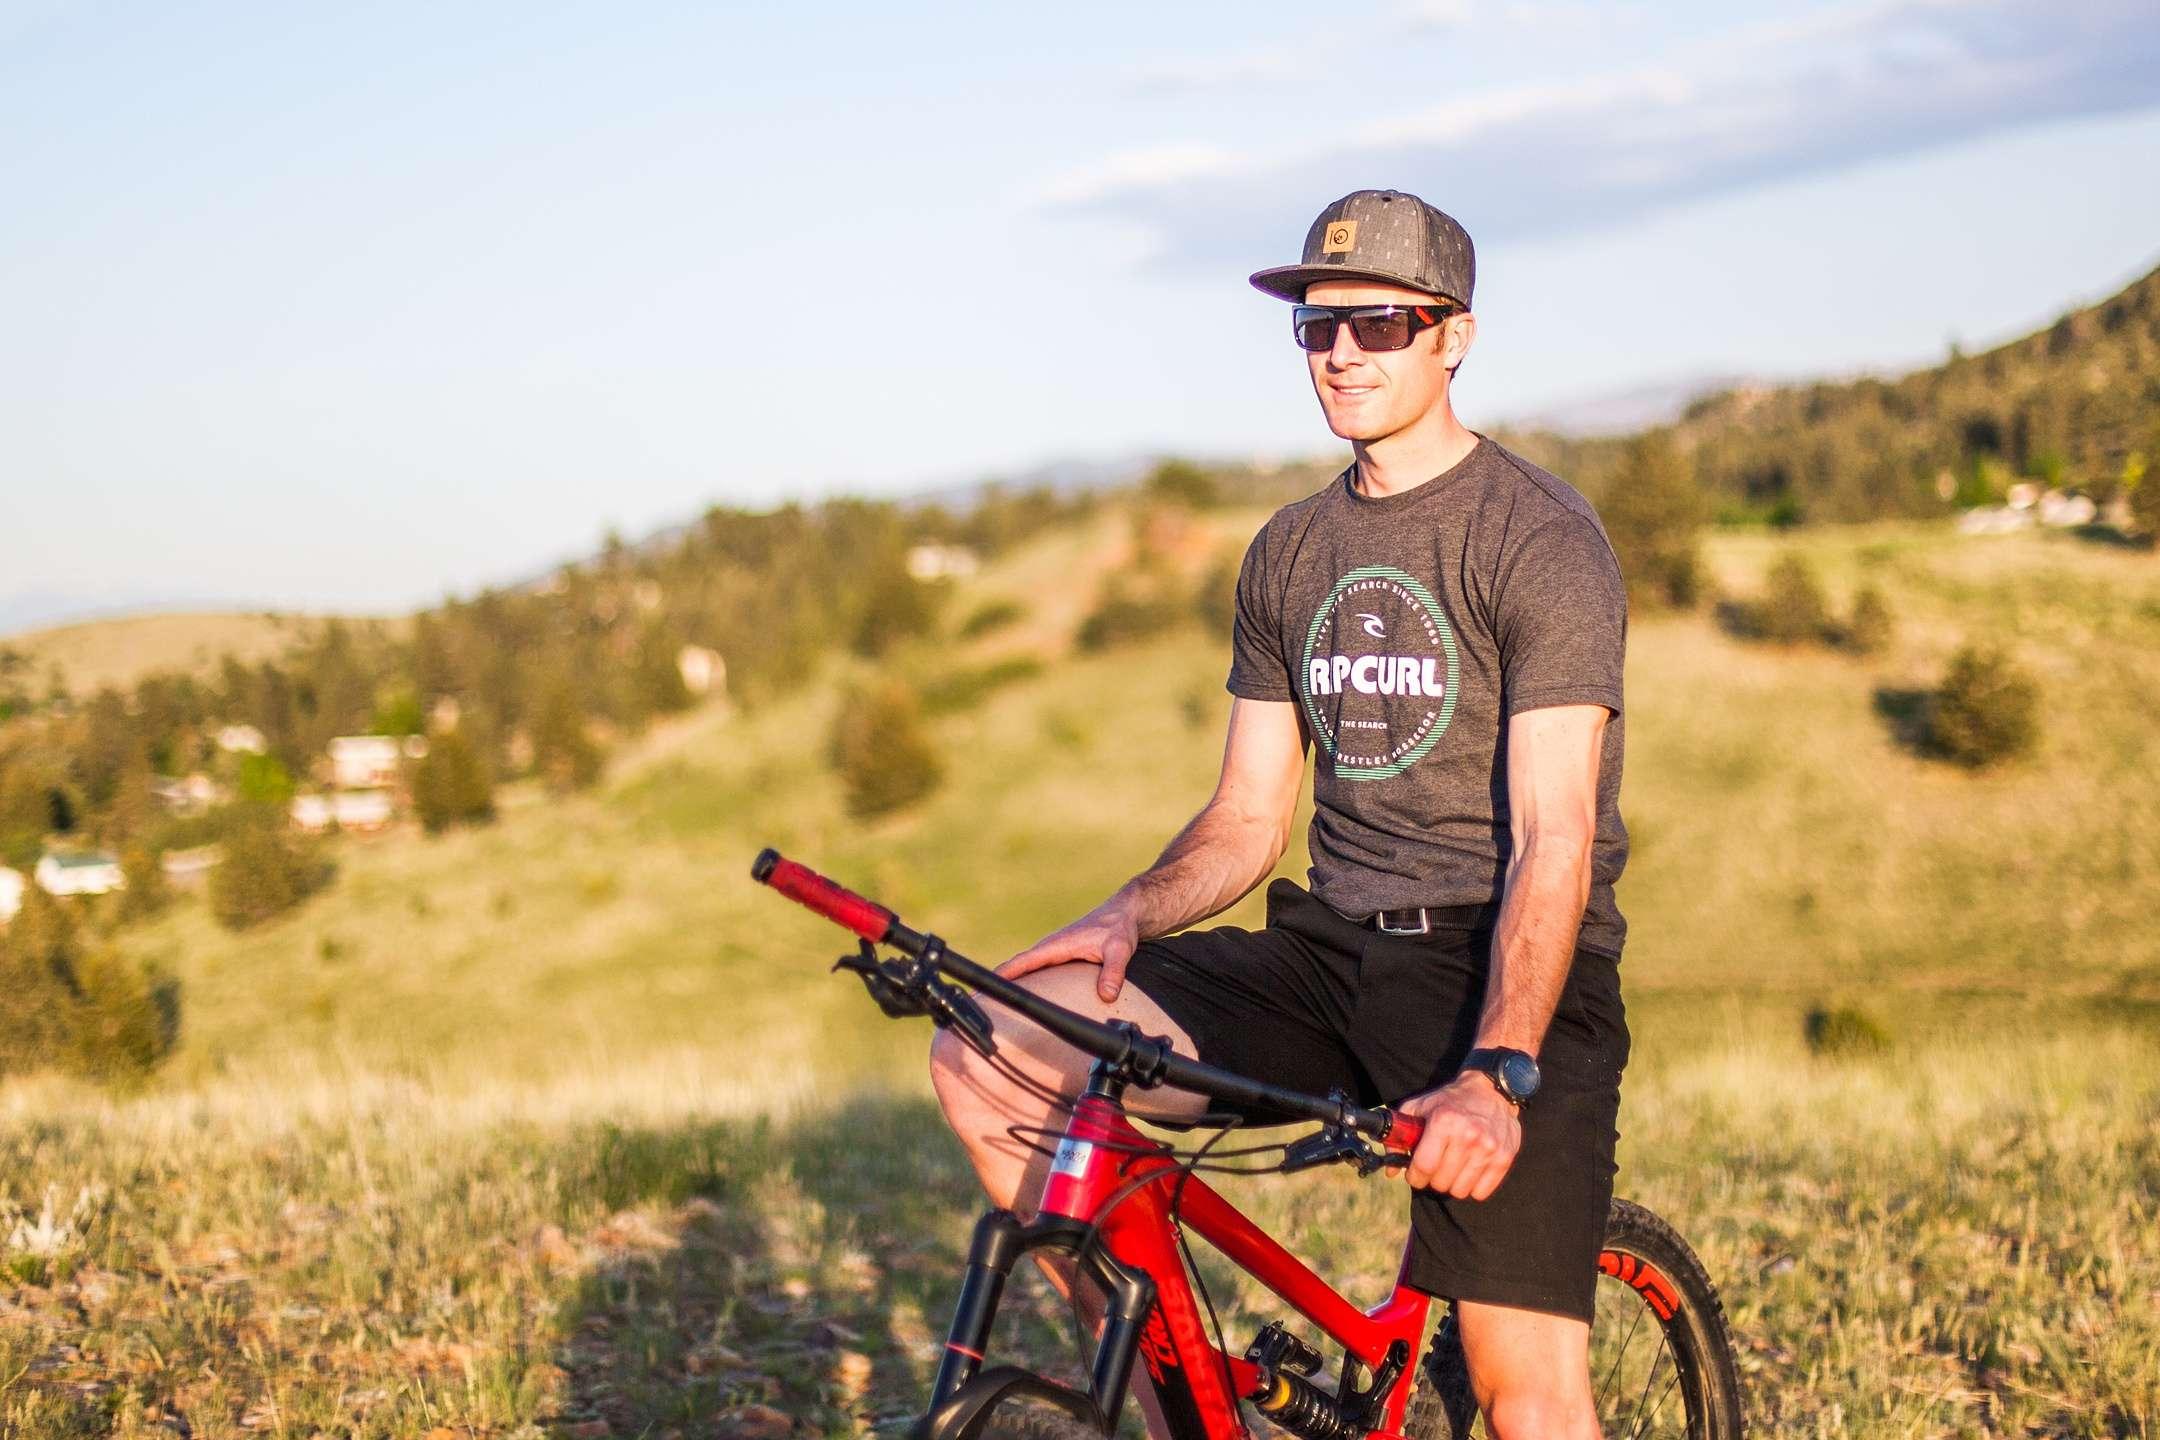 Daniel Barry, Owner of Grand Ridge Cyclery